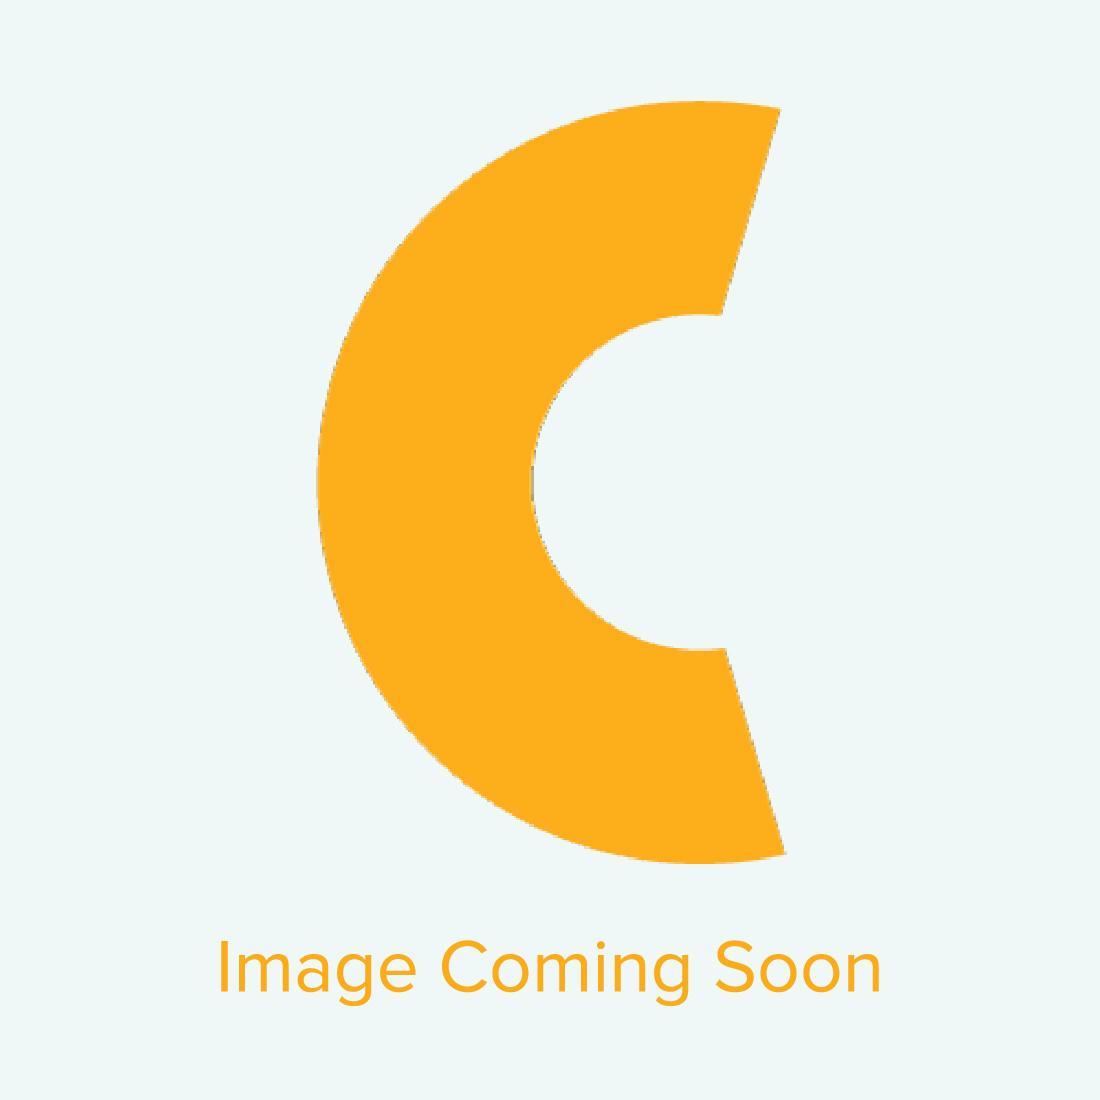 "Hotronix STX16 Auto Opening Digital Clamshell Heat Press Machine - 16"" x 16"""